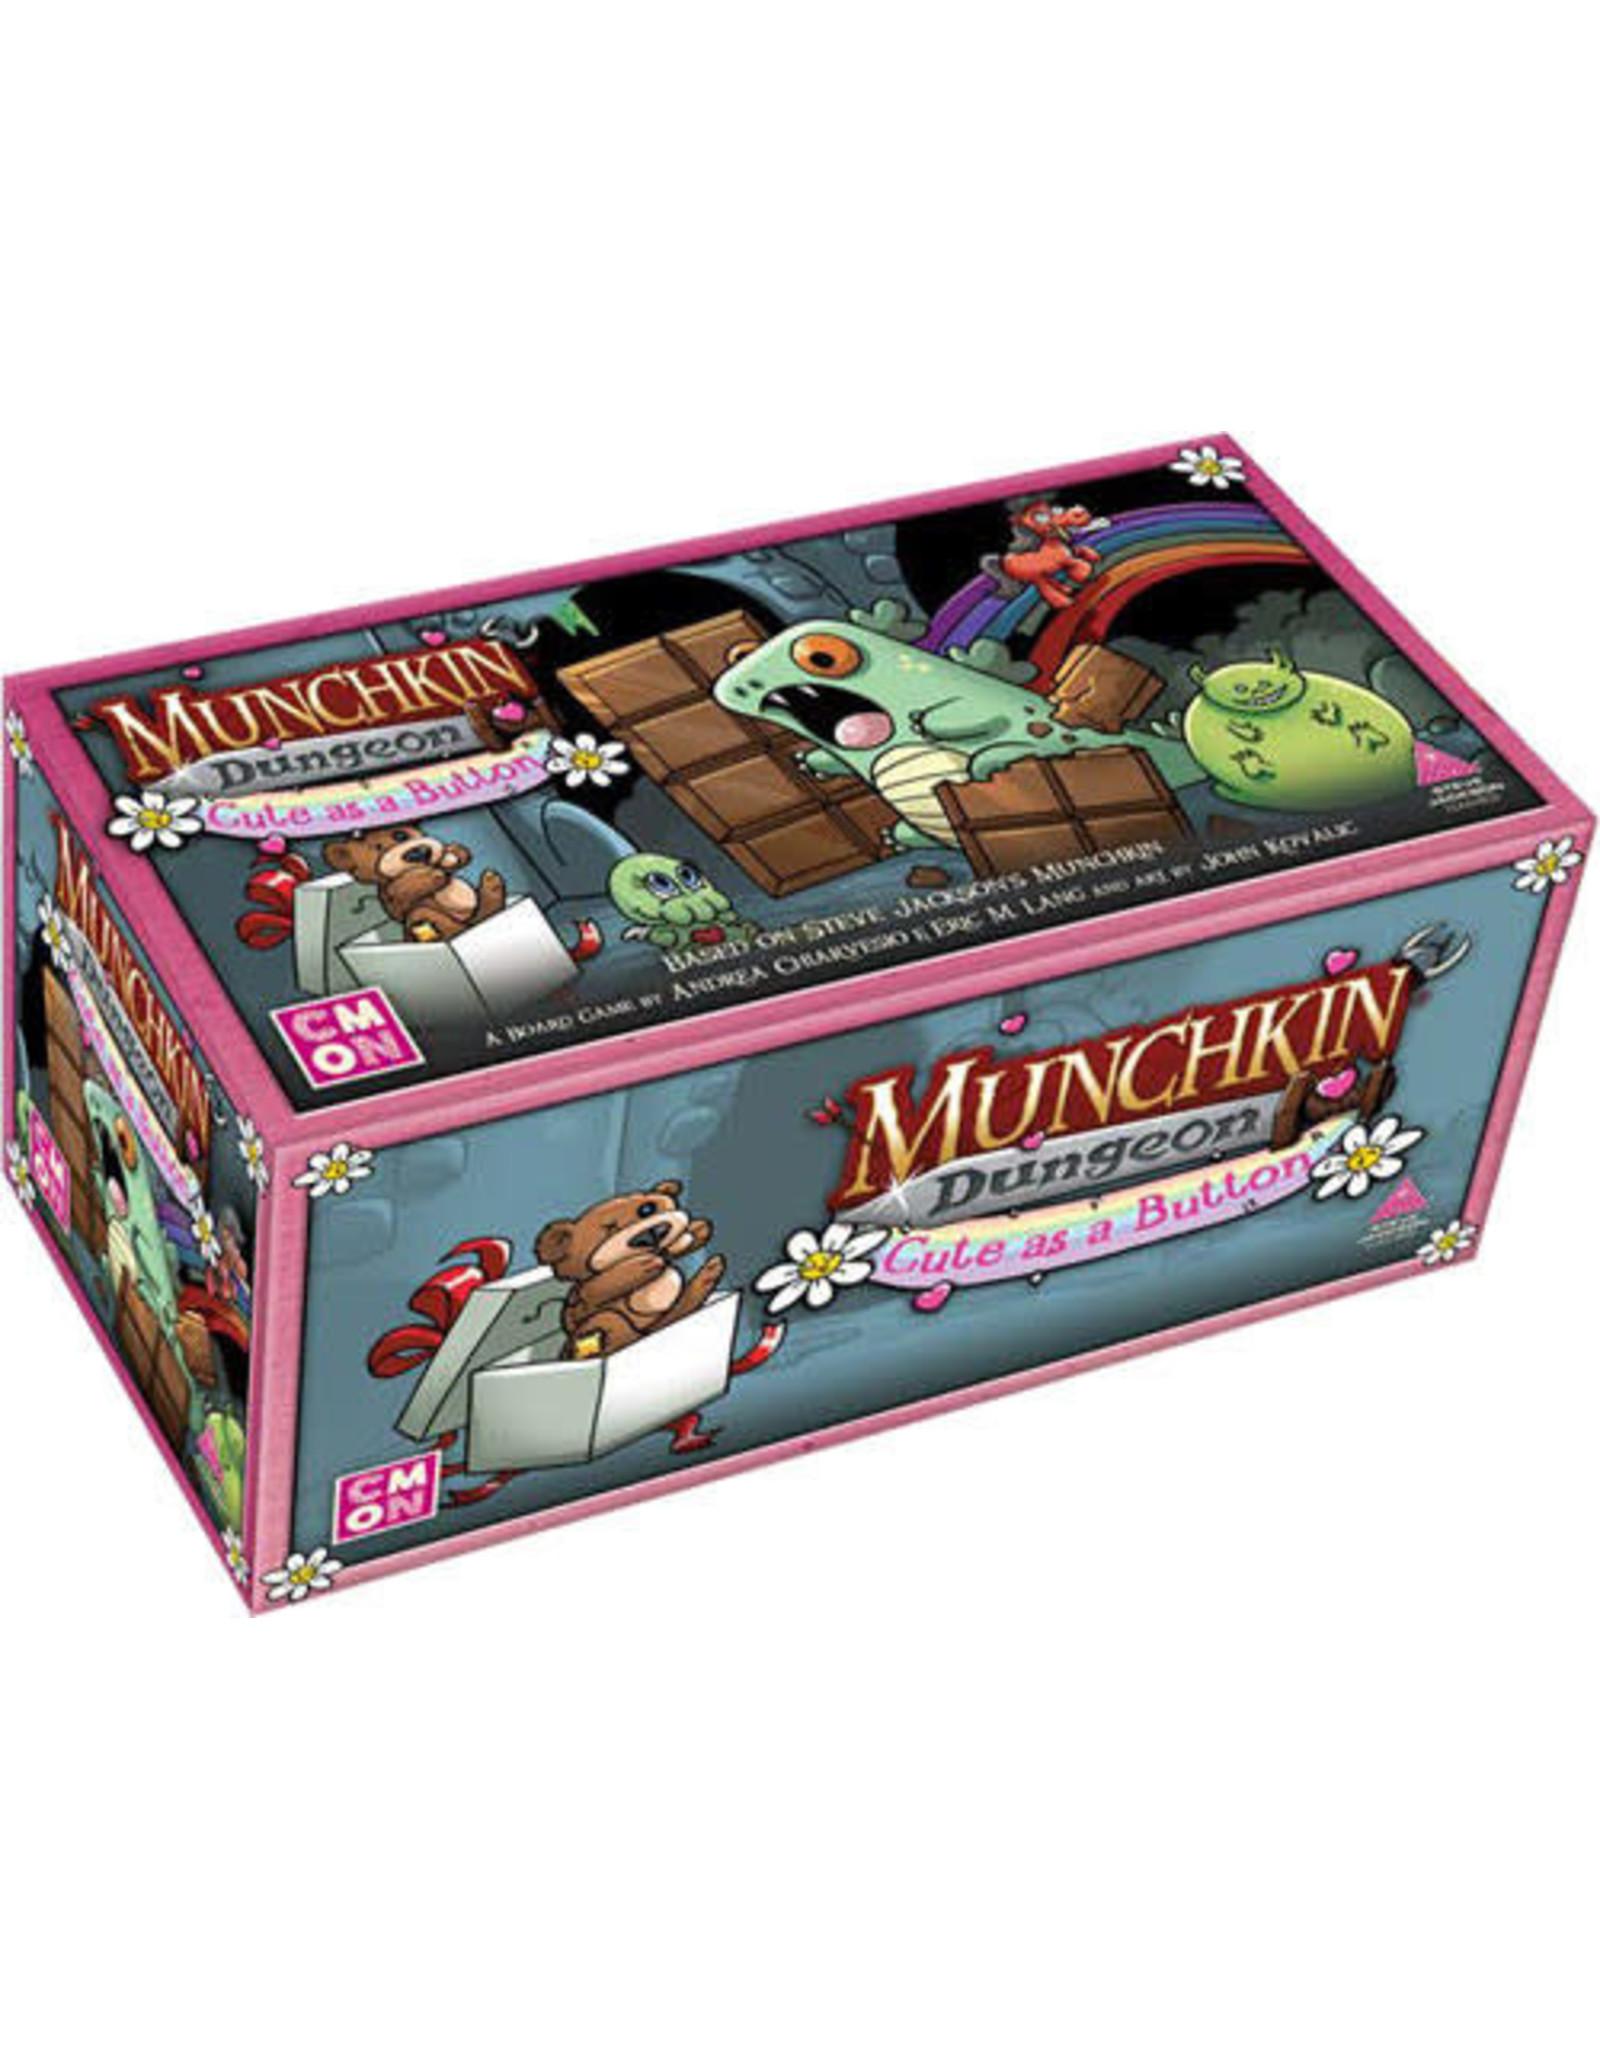 CMON Munchkin Dungeon Cute as a button Expansion